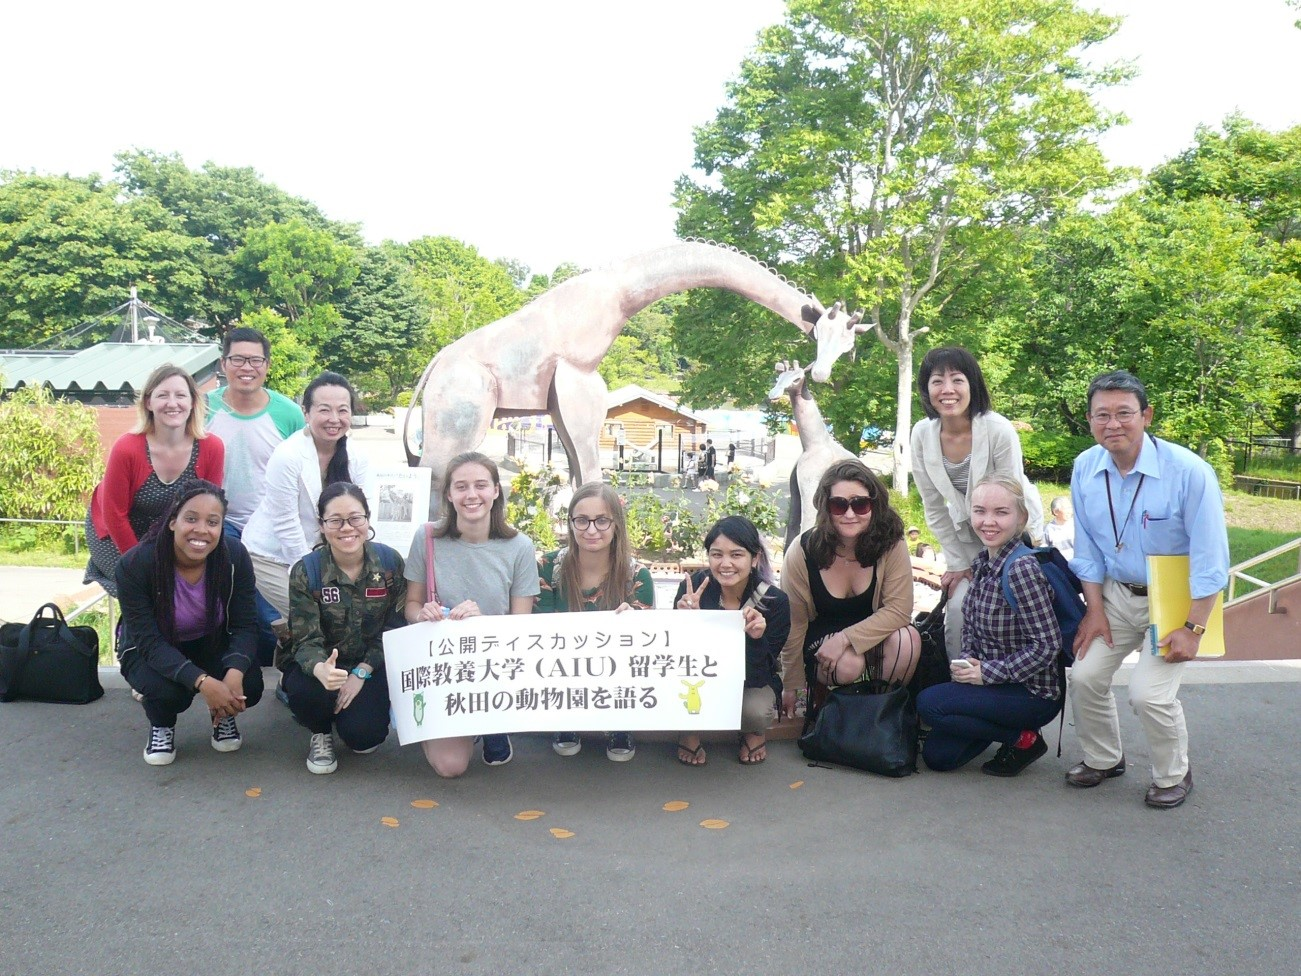 前列:留学生7名と右端が小松守園長、後列:コハン先生夫妻、千葉先生、平田先生